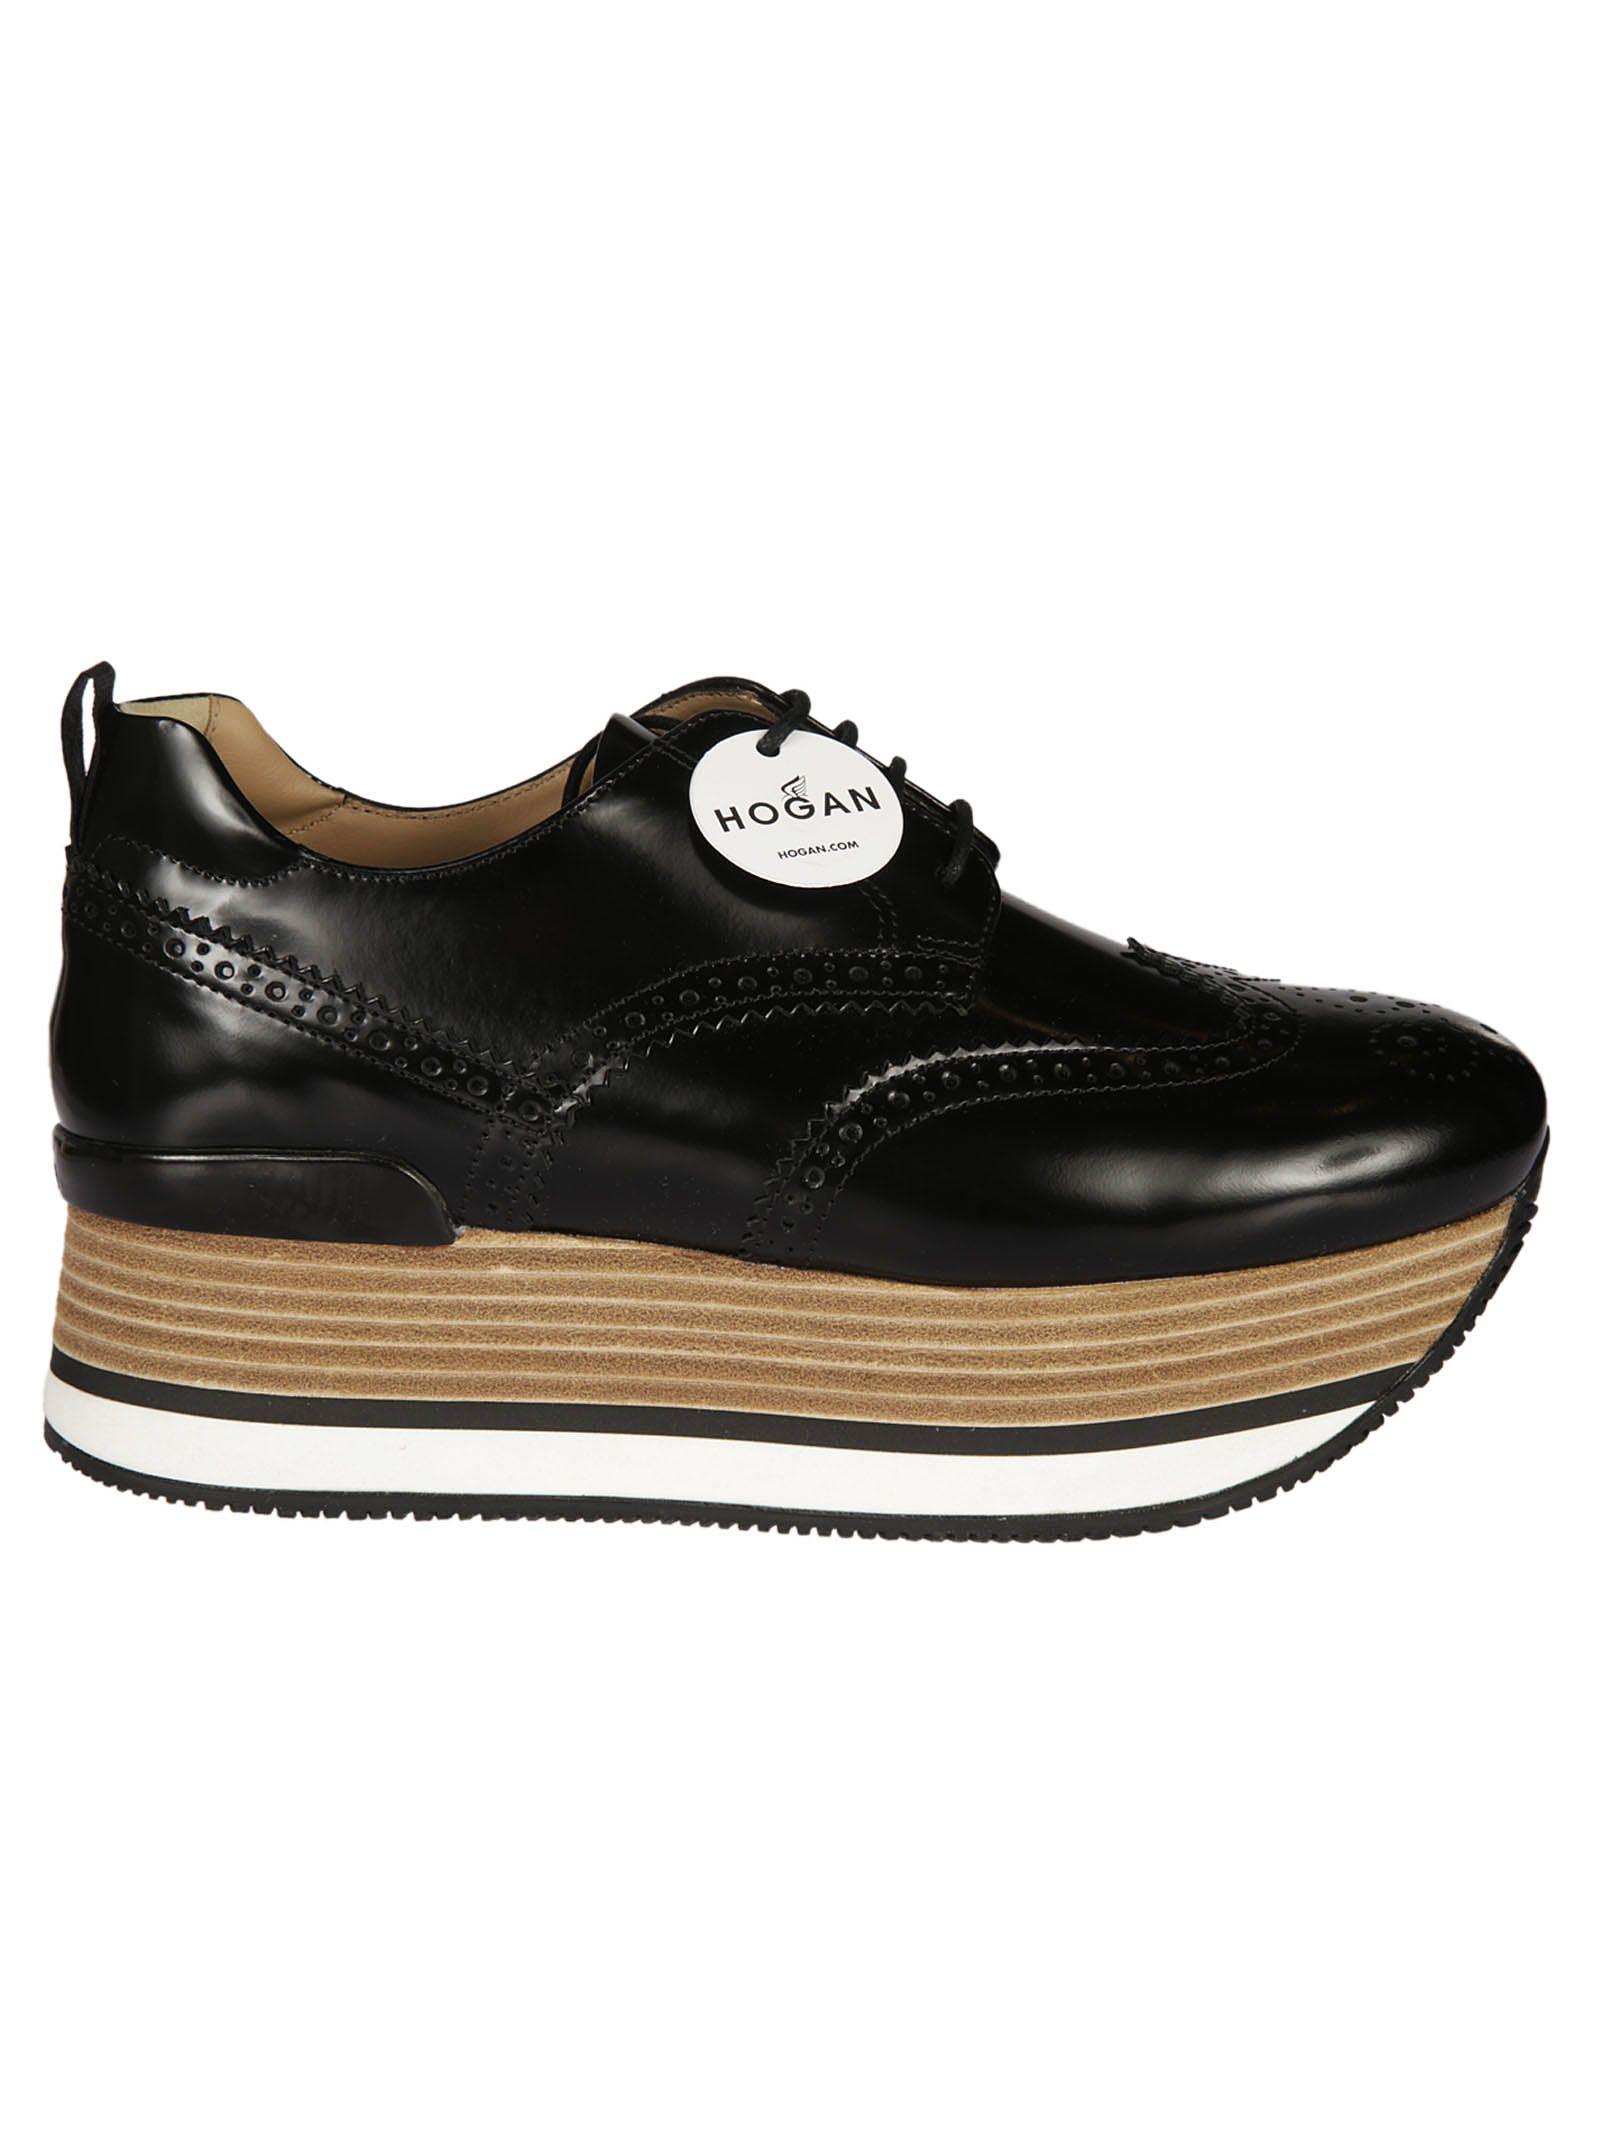 Hogan H222 Platform Sneakers